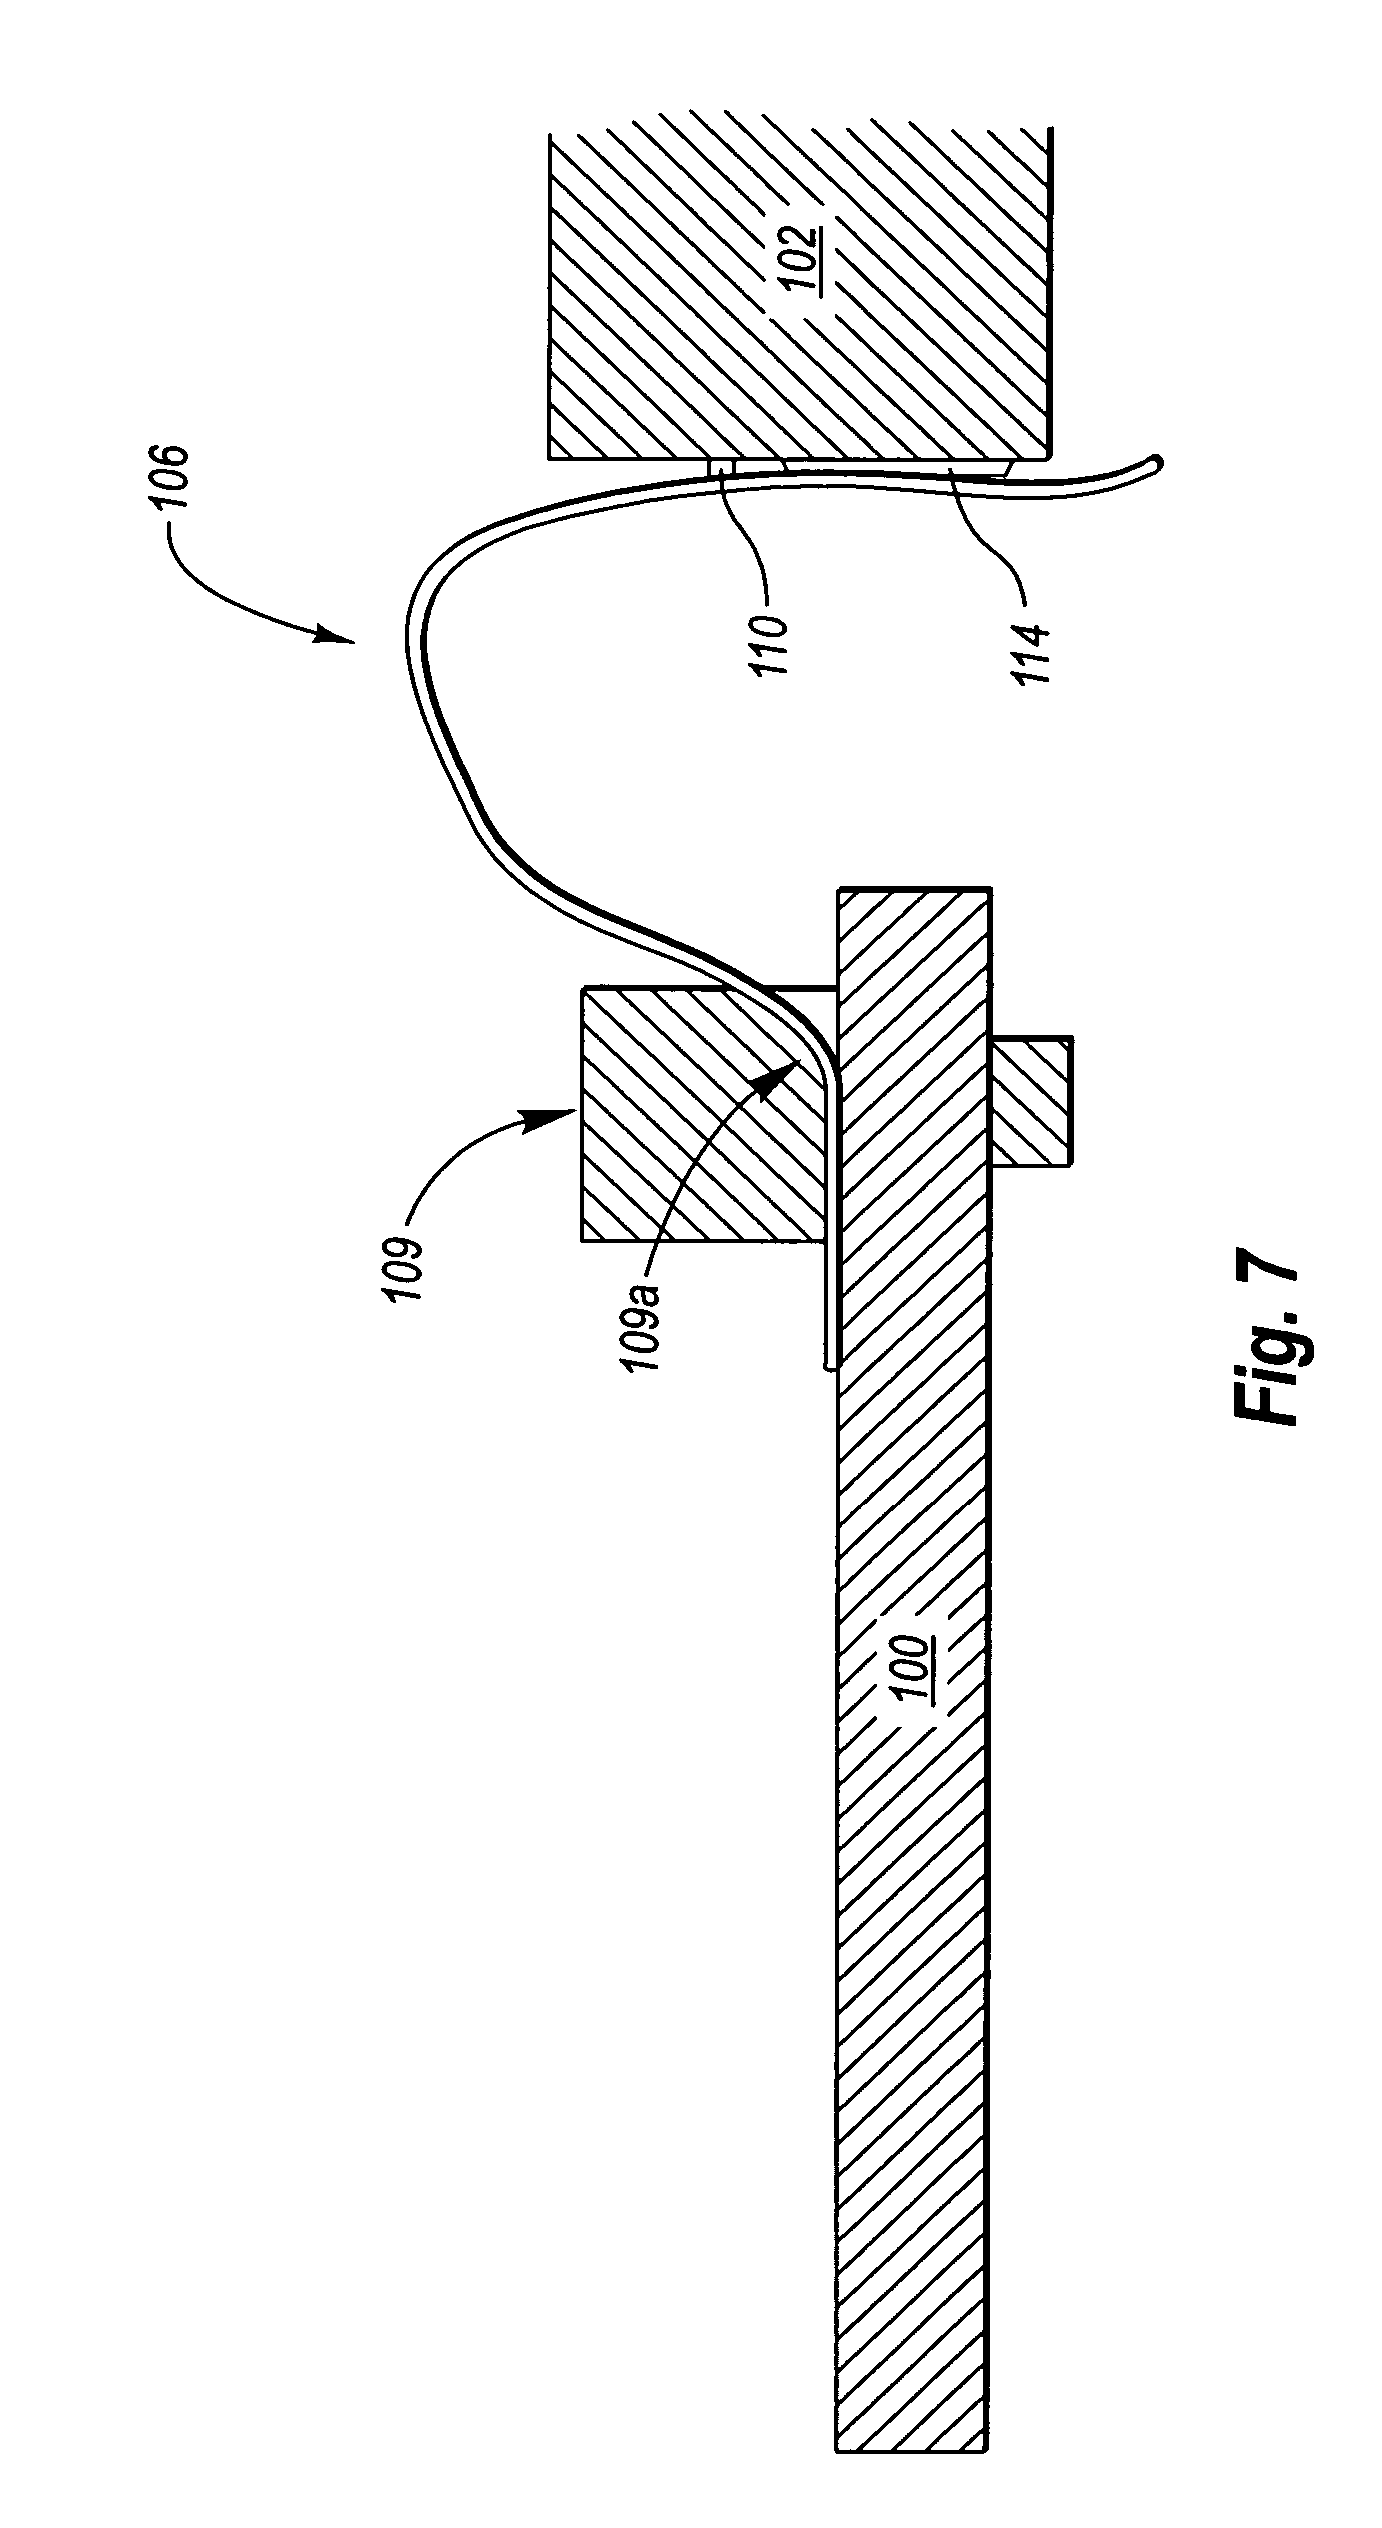 patent us20050245118 - flex circuit assembly